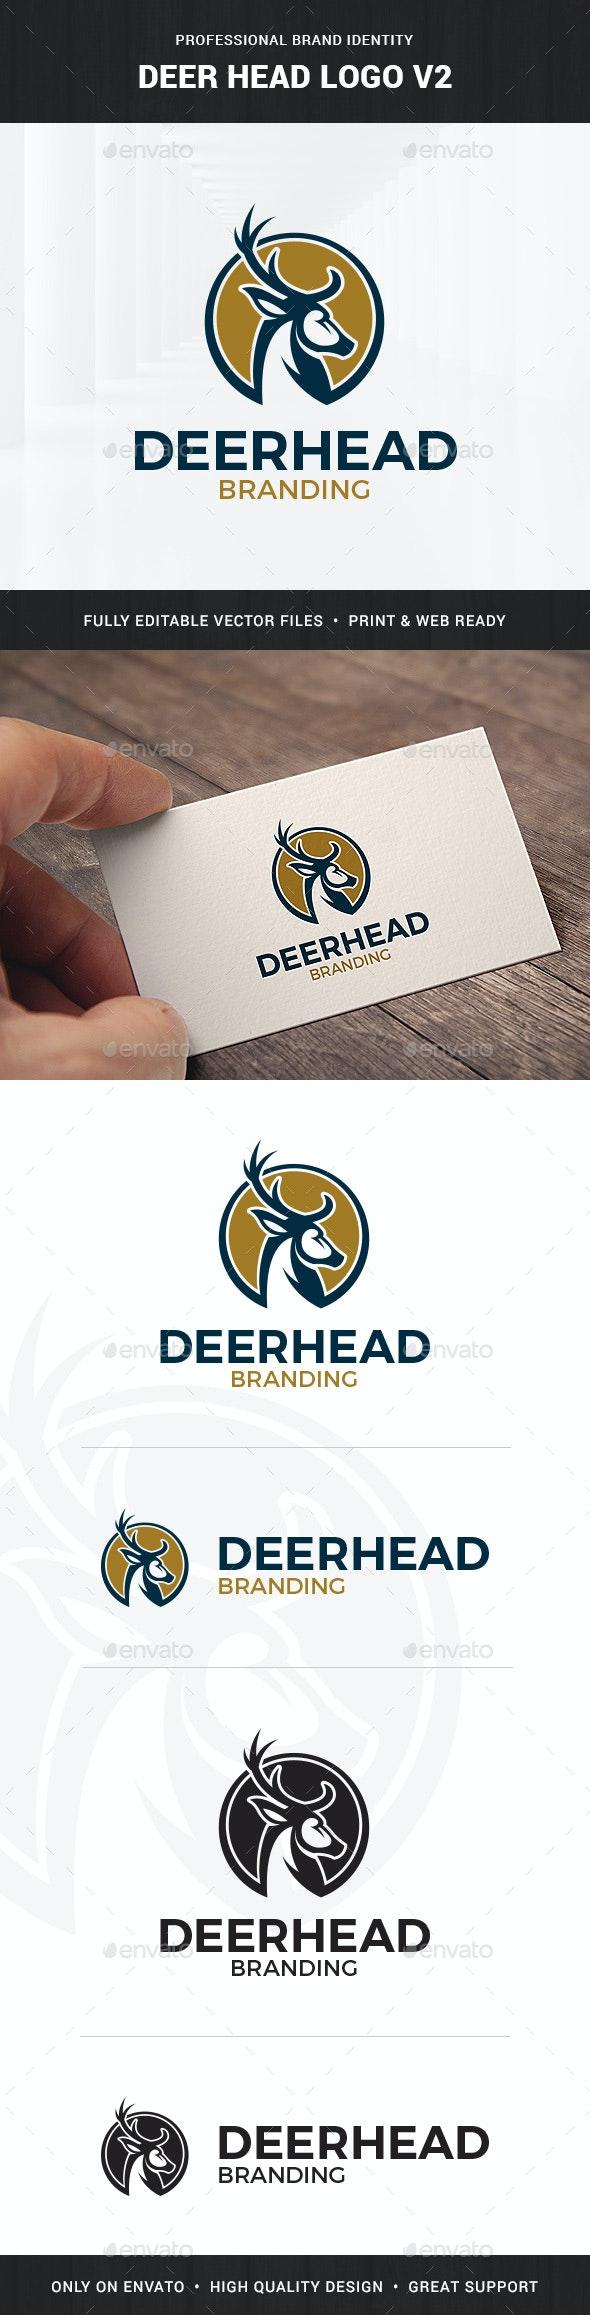 Deer Head Logo Template v2 - Animals Logo Templates